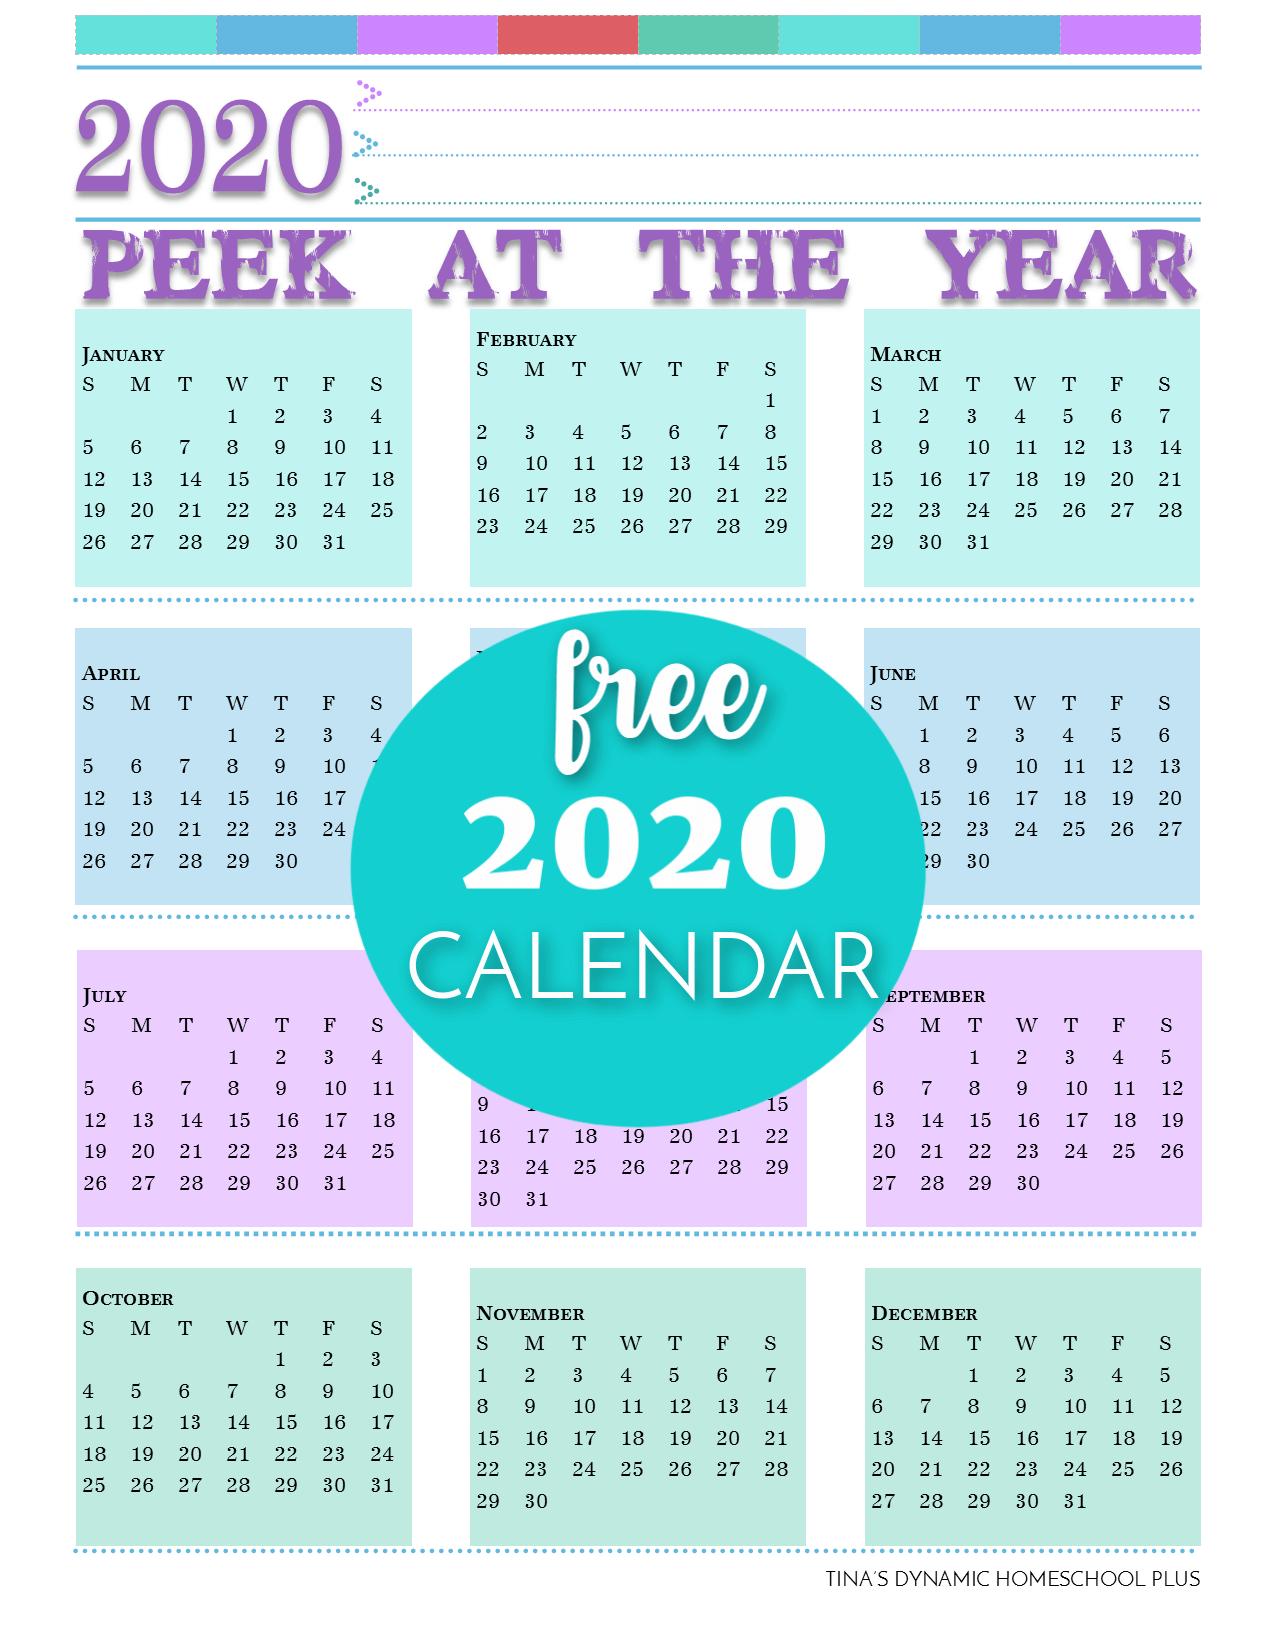 2020 Free Calendar (Add To Your Printable Homeschool Planner